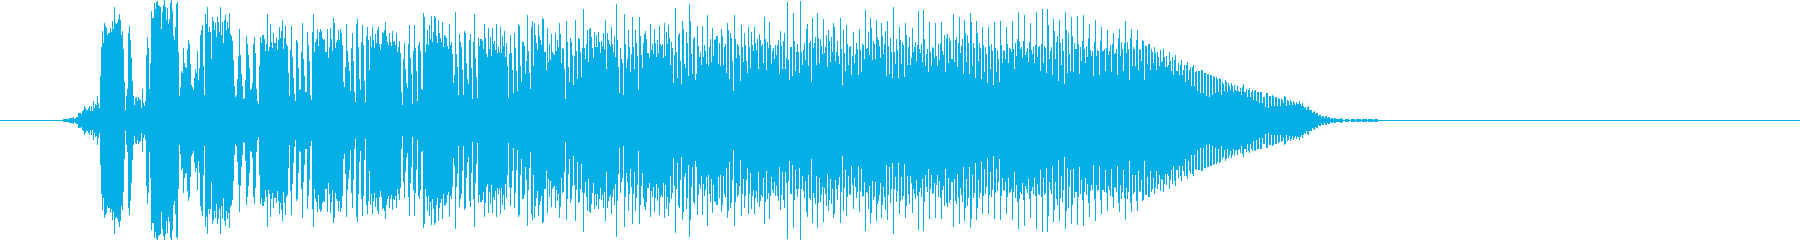 AMGアナログFX 32の再生済みの波形